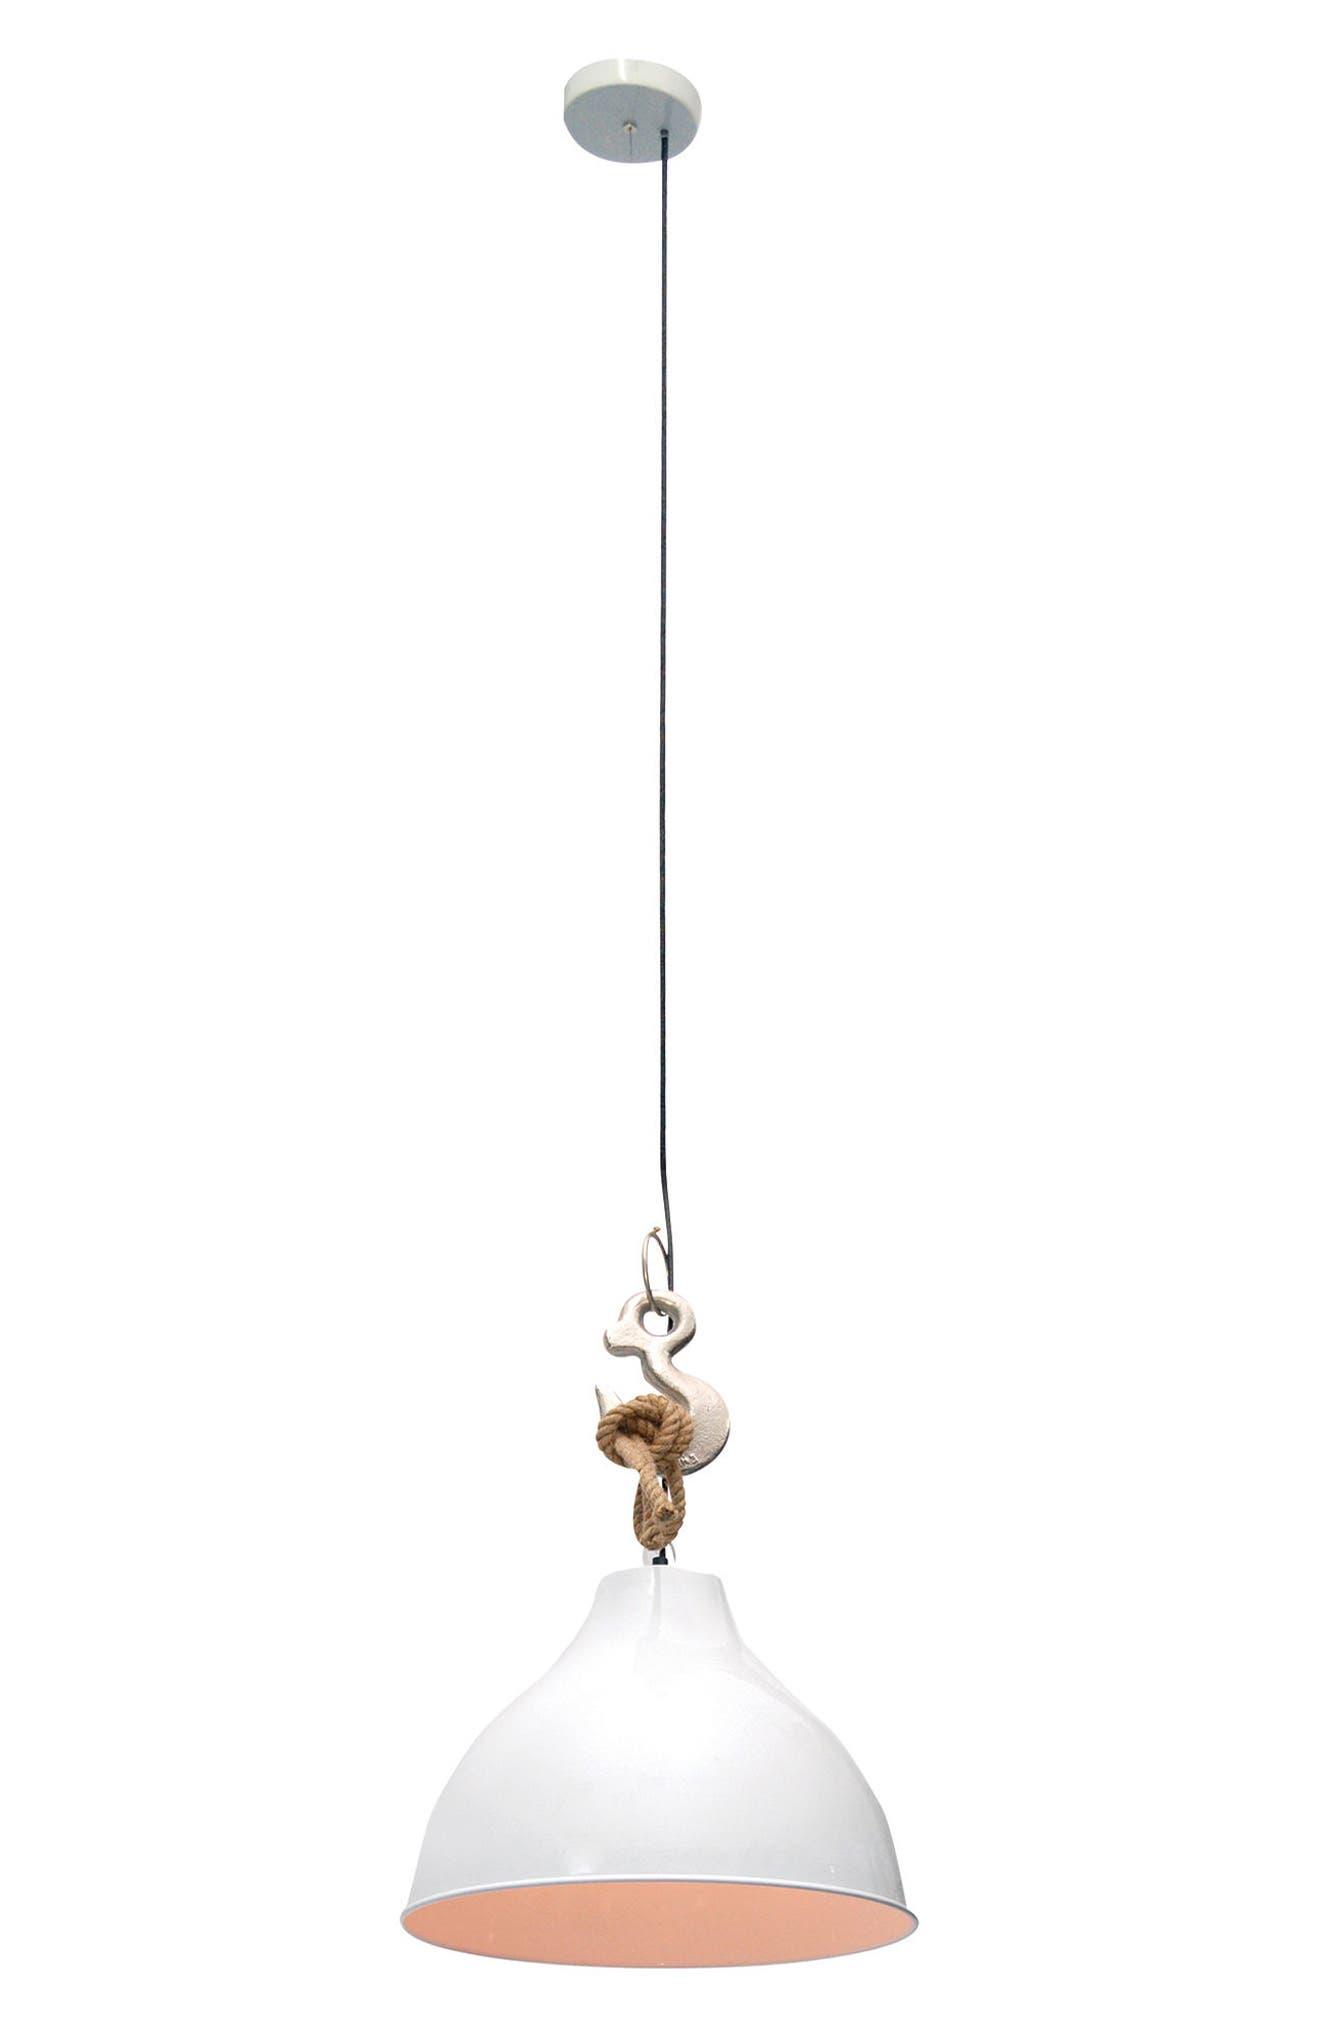 Renwil Audrey Ceiling Light Fixture